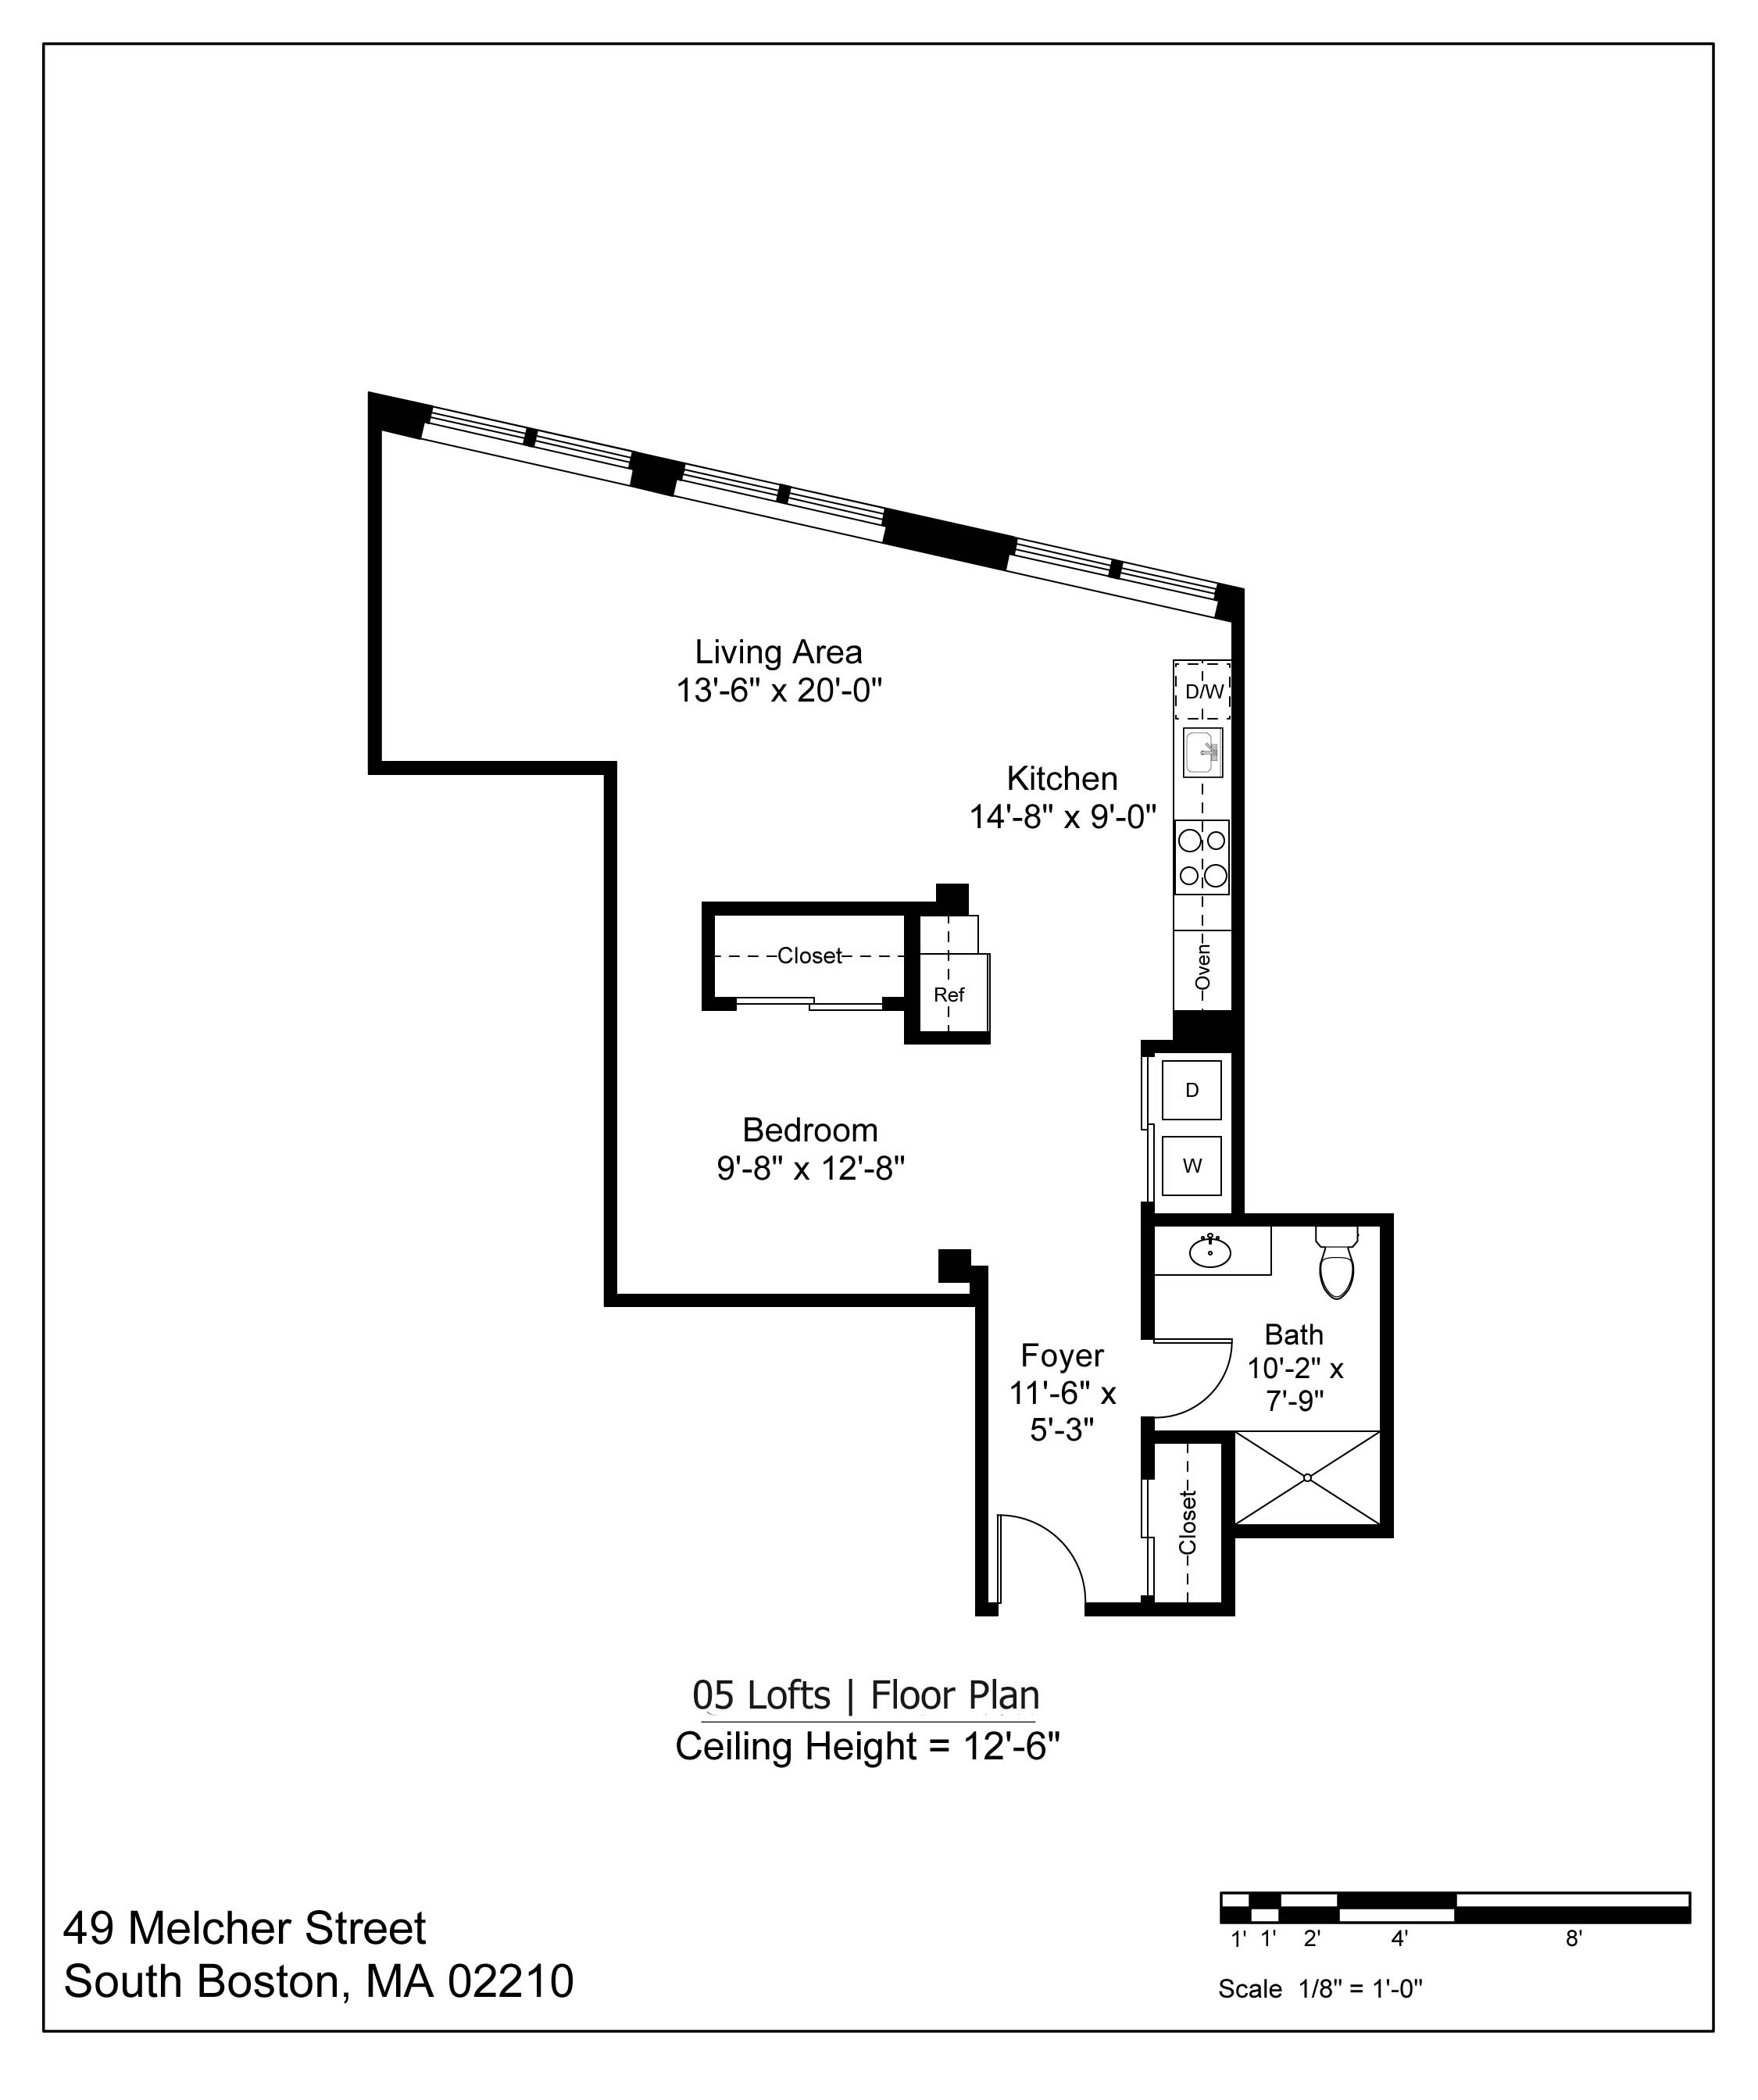 05 LOFT FLOOR PLAN - 885 SF   $3000-3200/MONTH